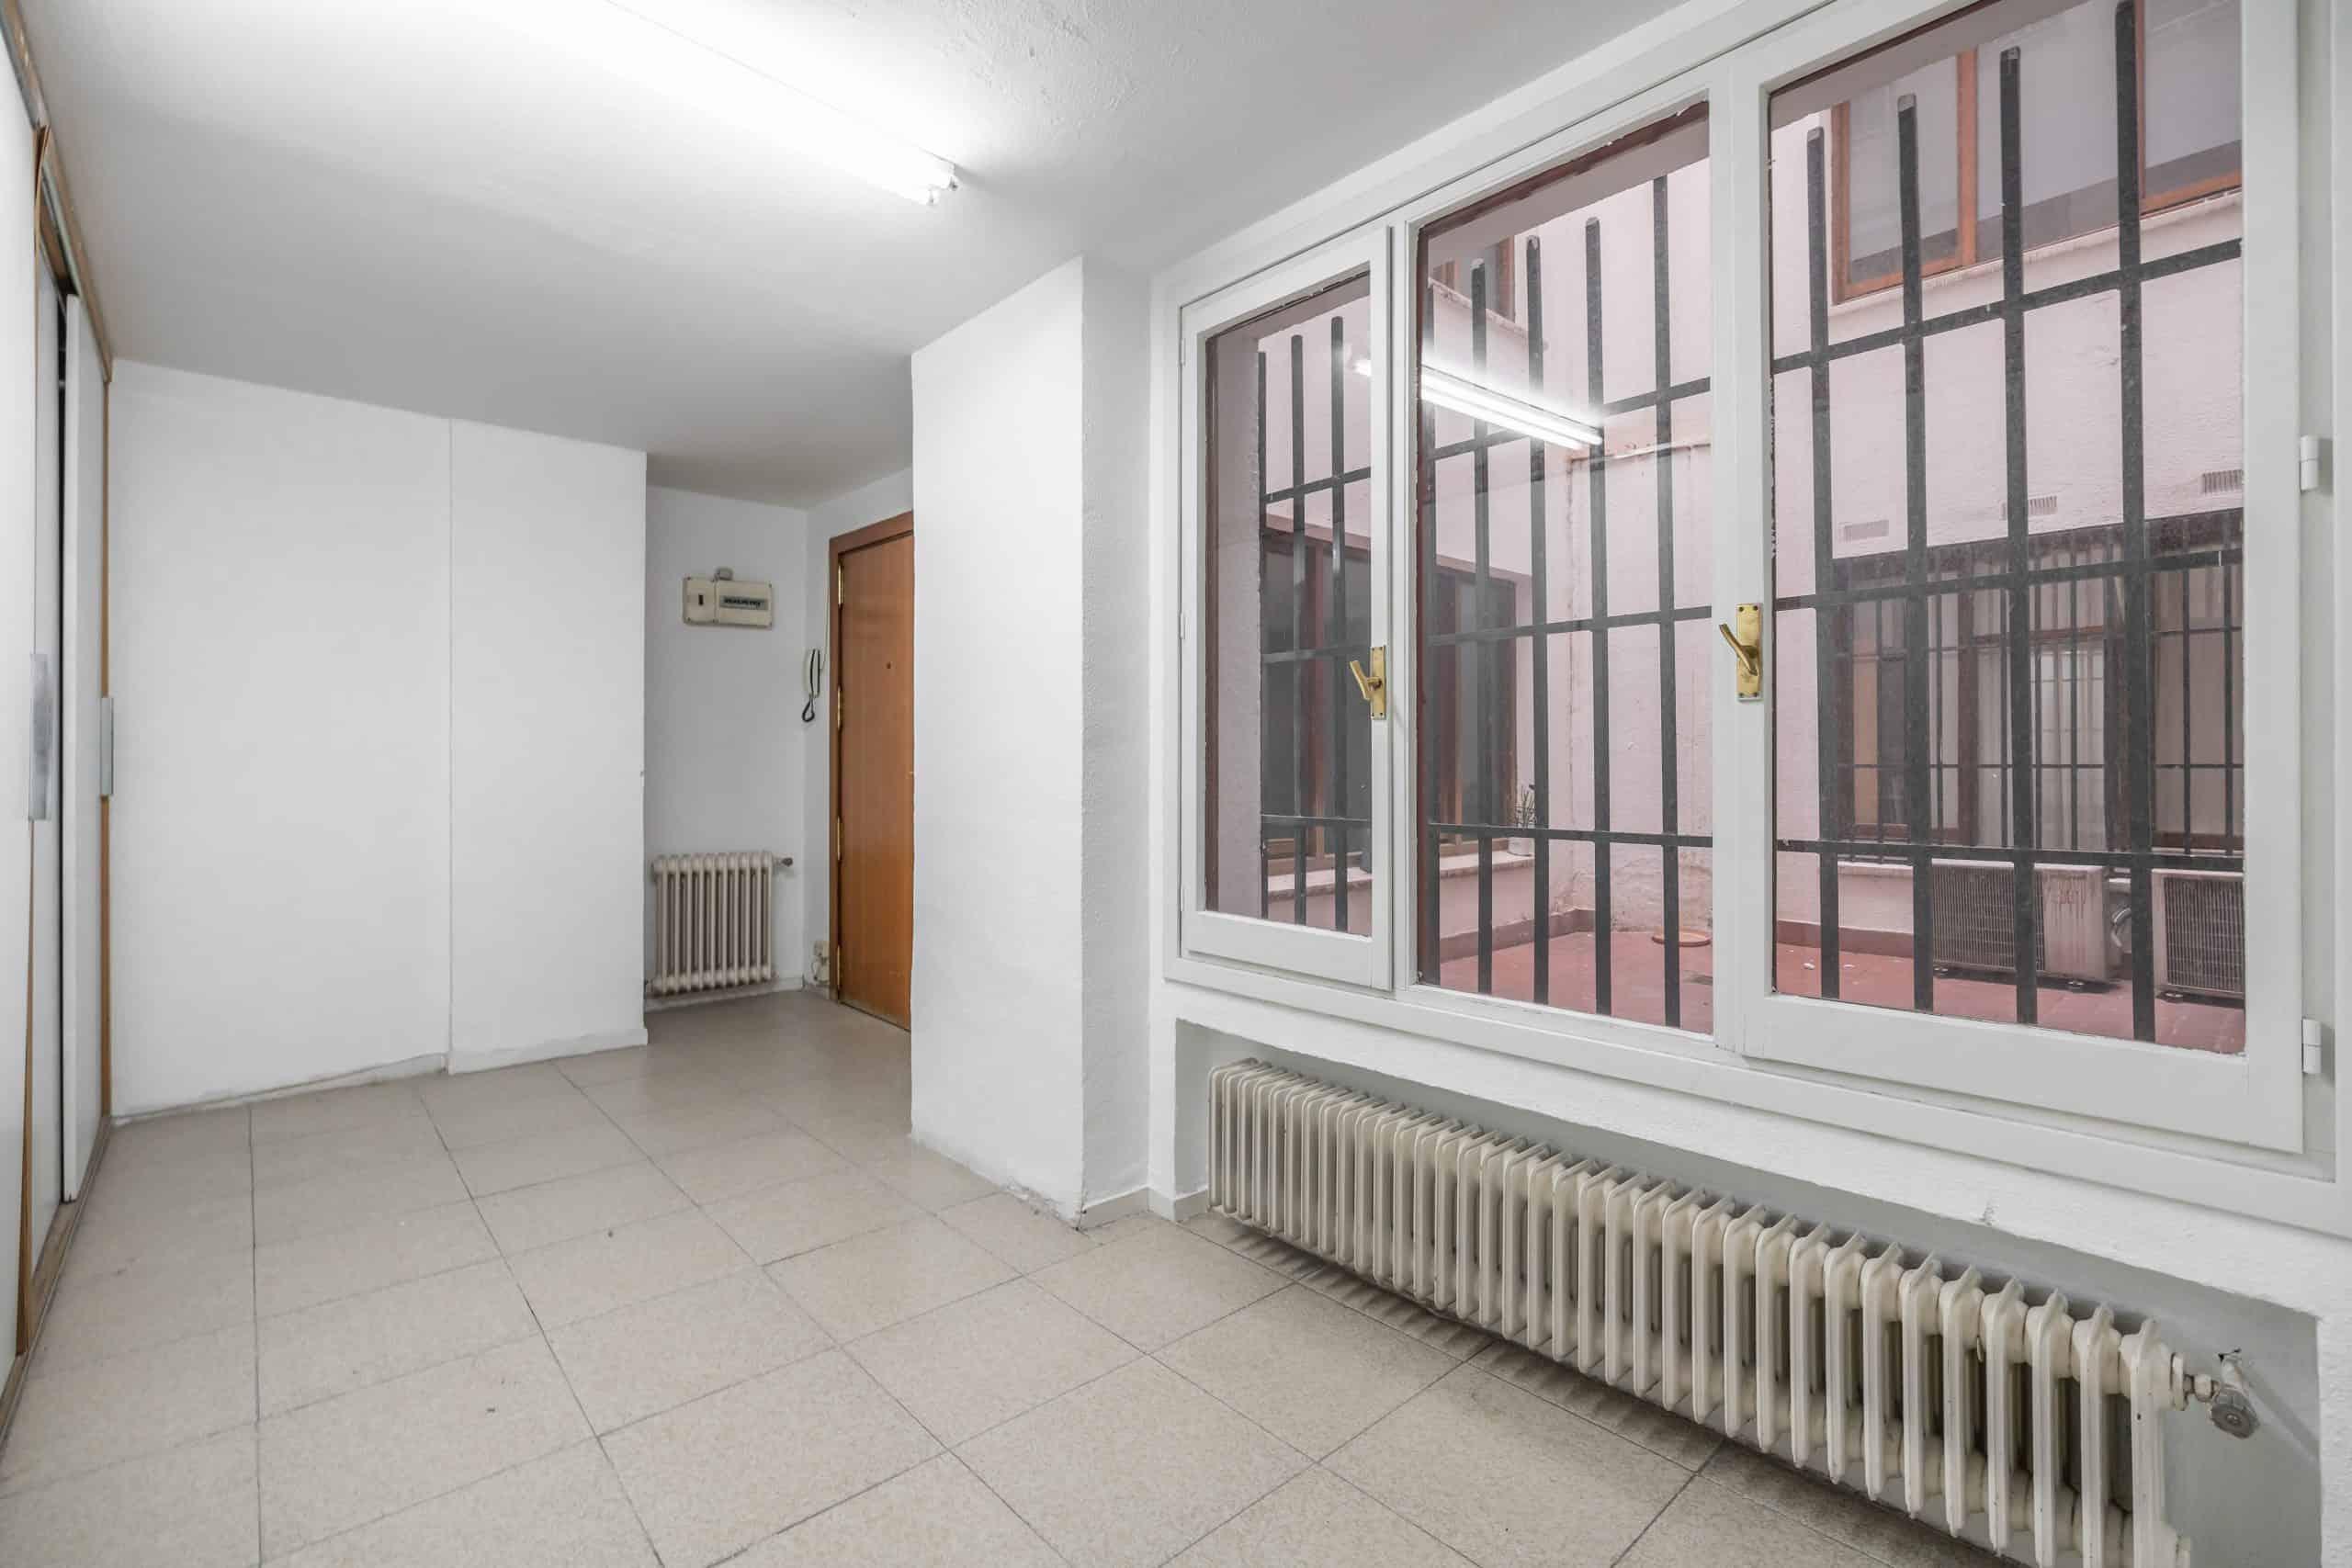 Agencia Inmobiliaria de Madrid-FUTUROCASA-Zona ARGANZUELA-LEGAZPI -calle Modesto Lafuente 41,1ºC entrada 1